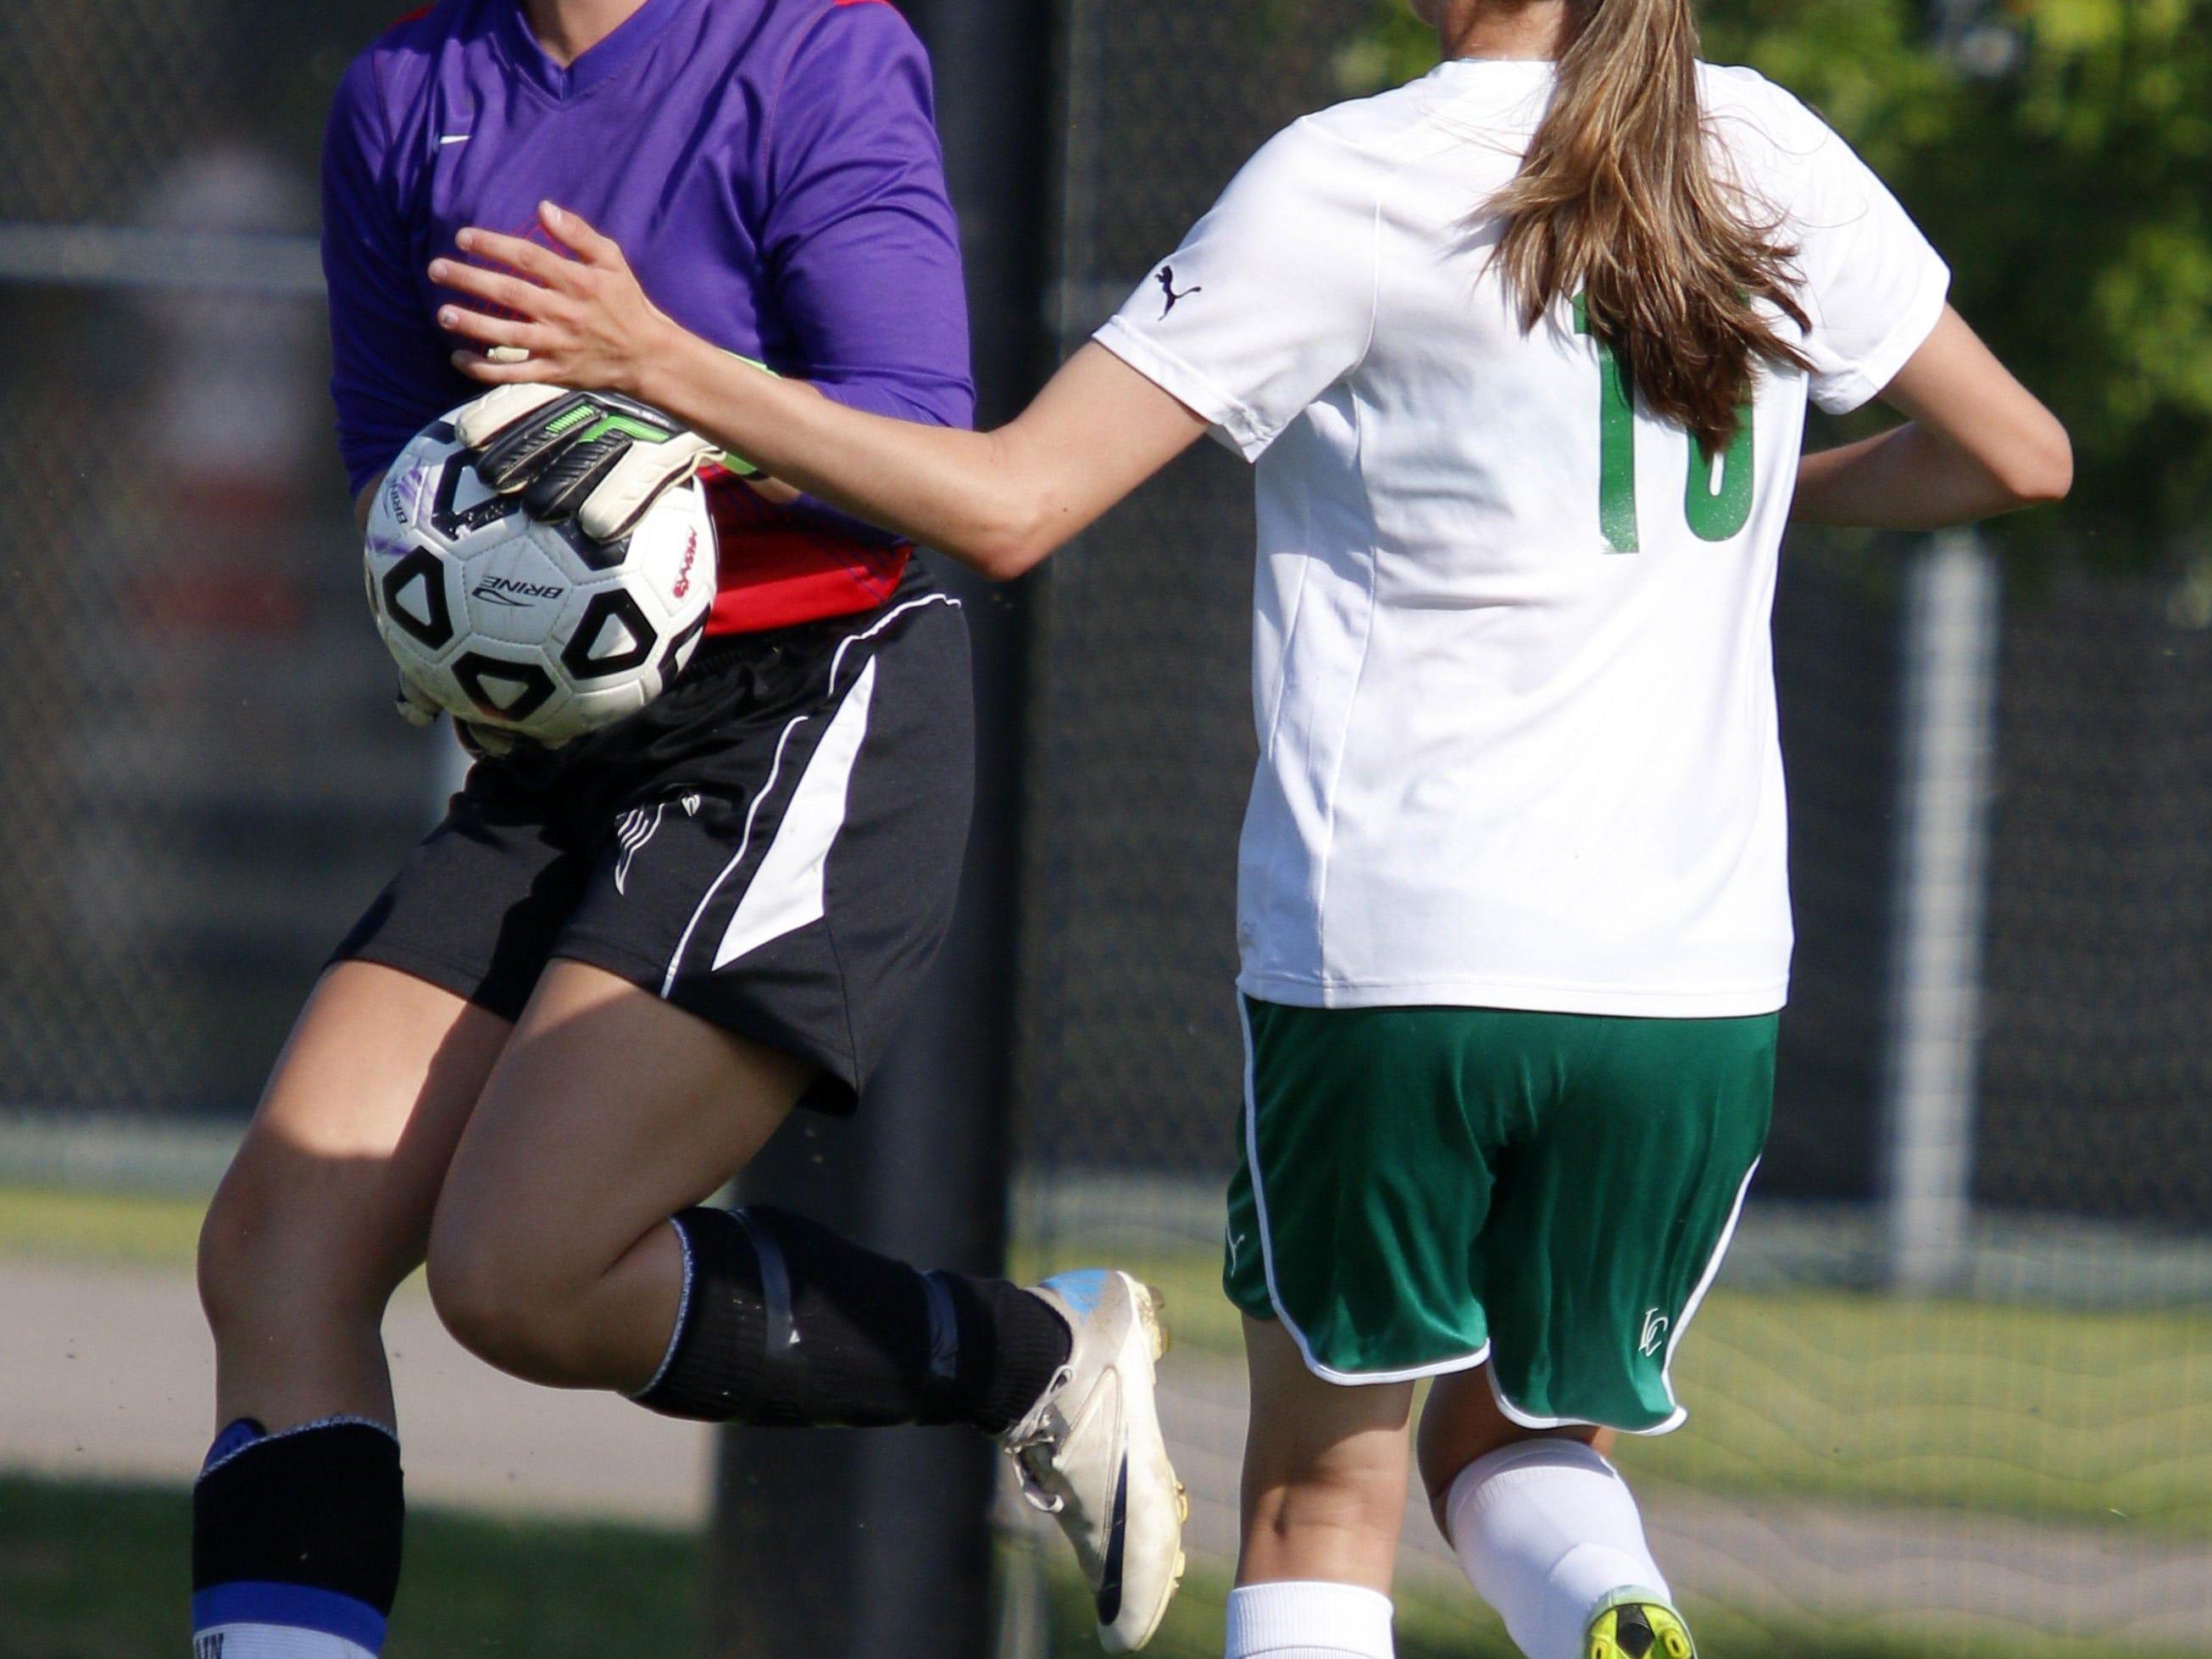 Leslie goalie Sadie Prieskorn, left, stops a shot in front of Jackson Lumen Christi's Riley Raburn in their soccer regional game, Wednesday, June 3, 2015, in Williamston, Mich.